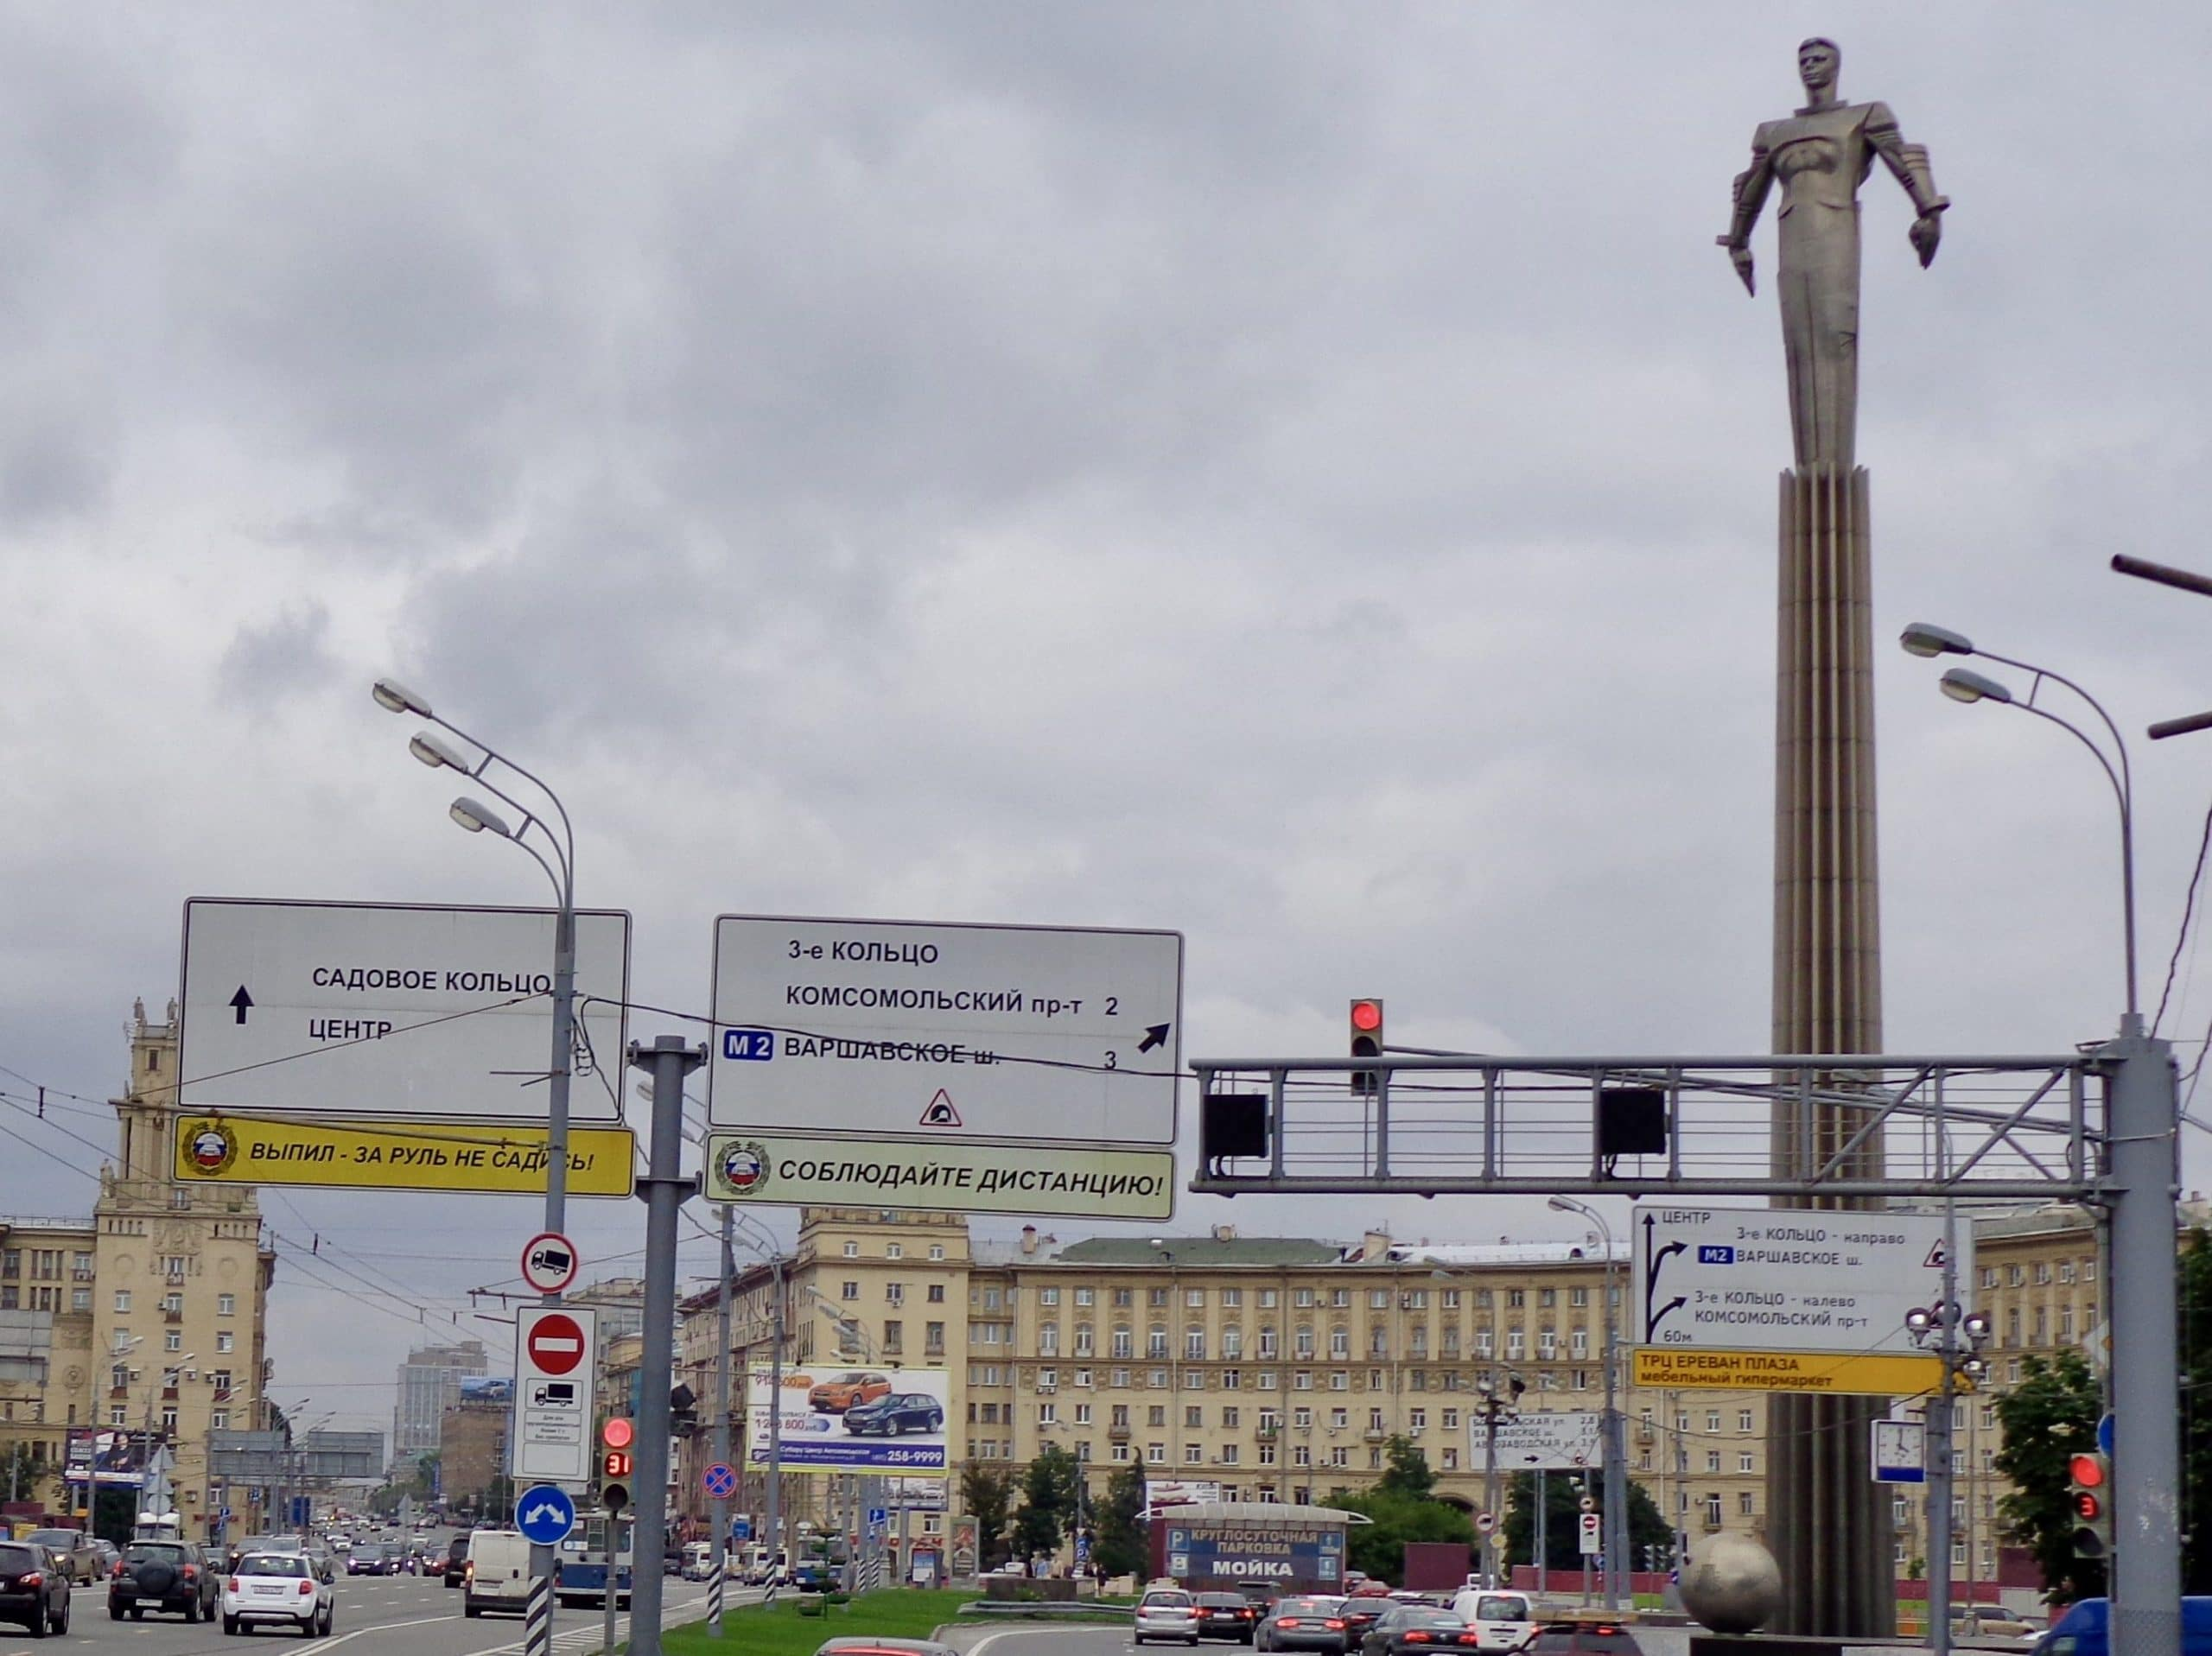 Het 42,5 meter hoge standbeeld van Yuri Gagarin, Lenin prospect, Moskou